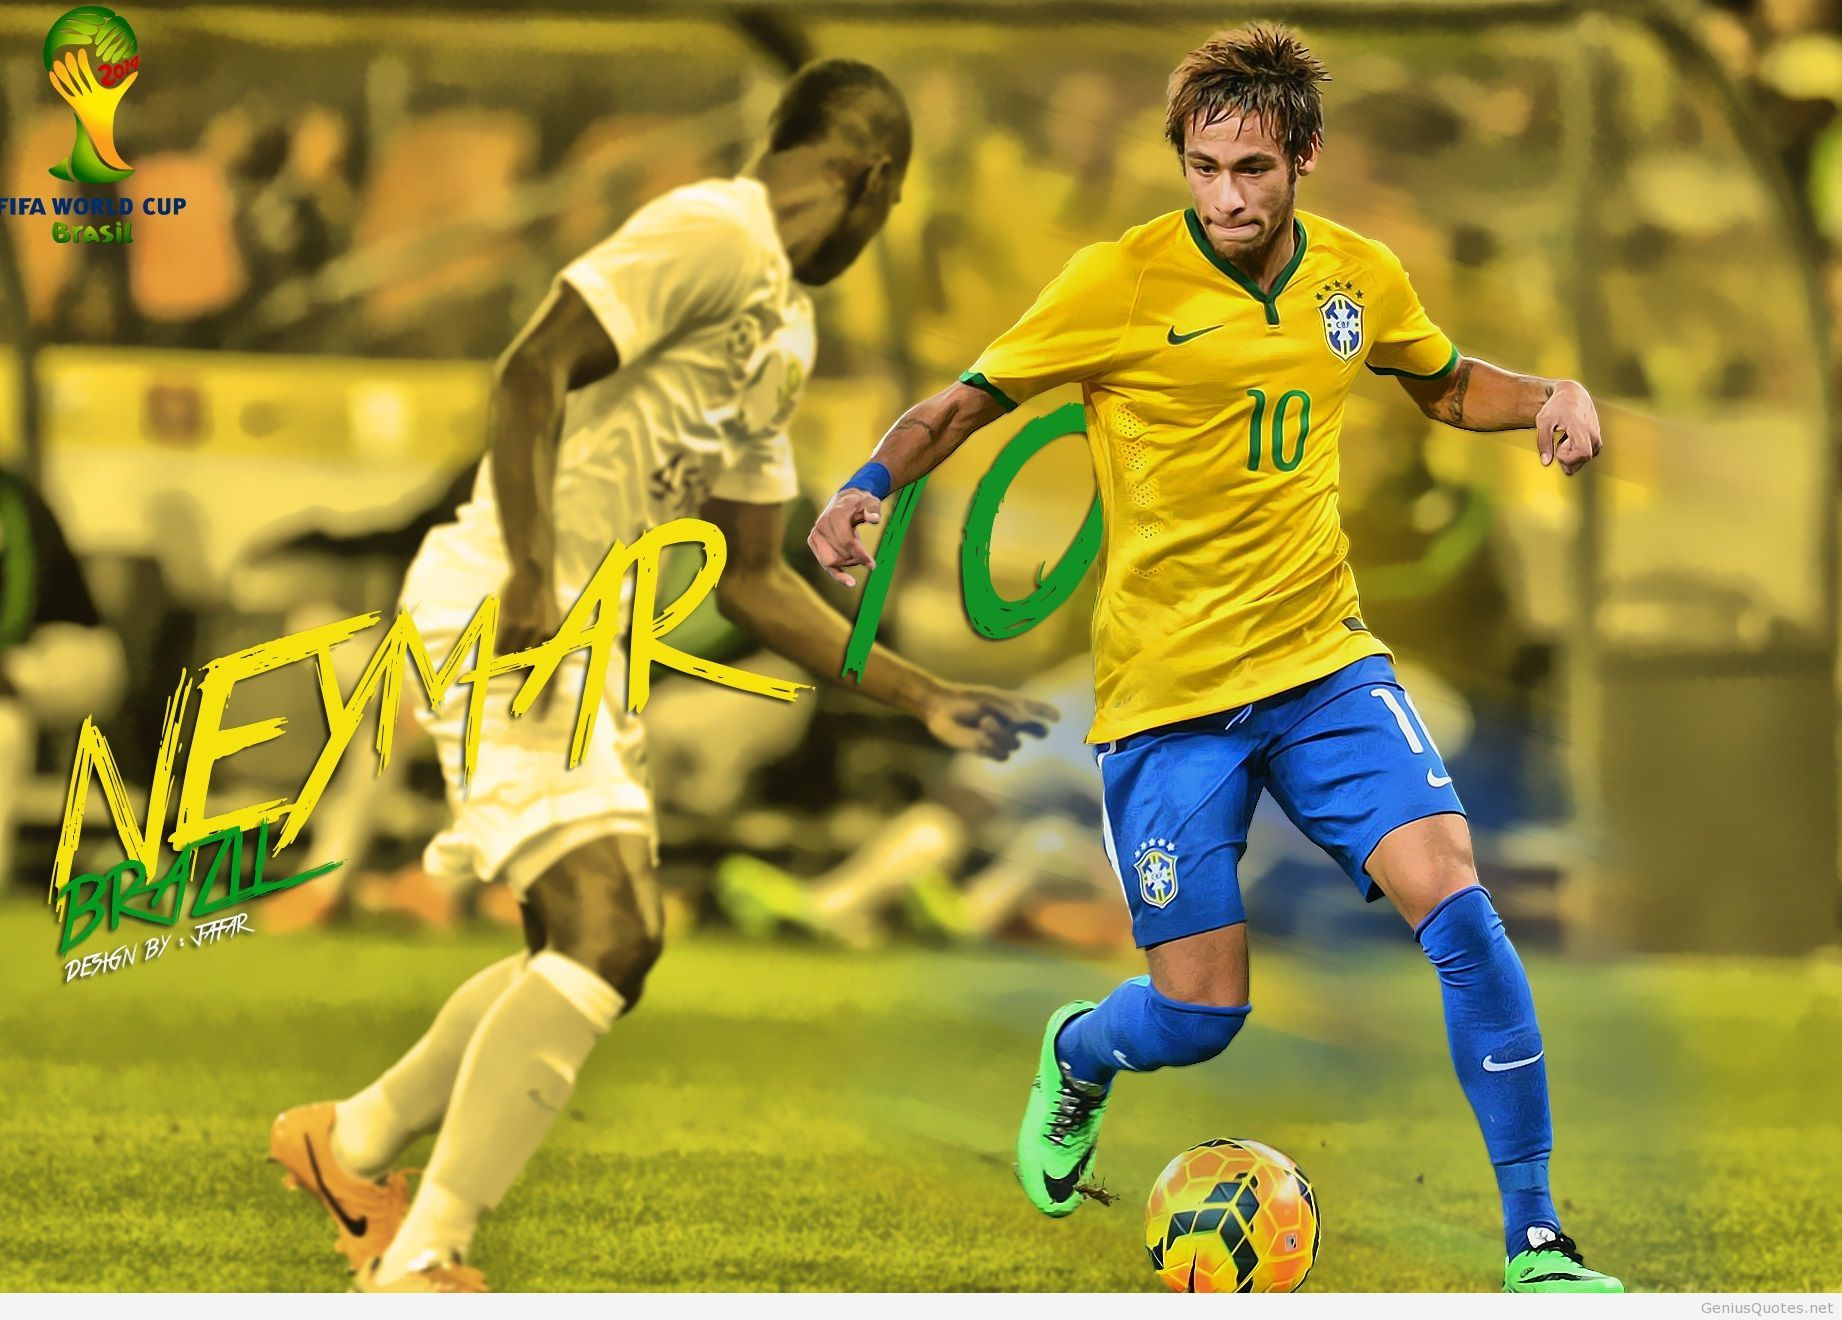 Fifa Brazil Neymar D Wallpaper Wallpapersafari